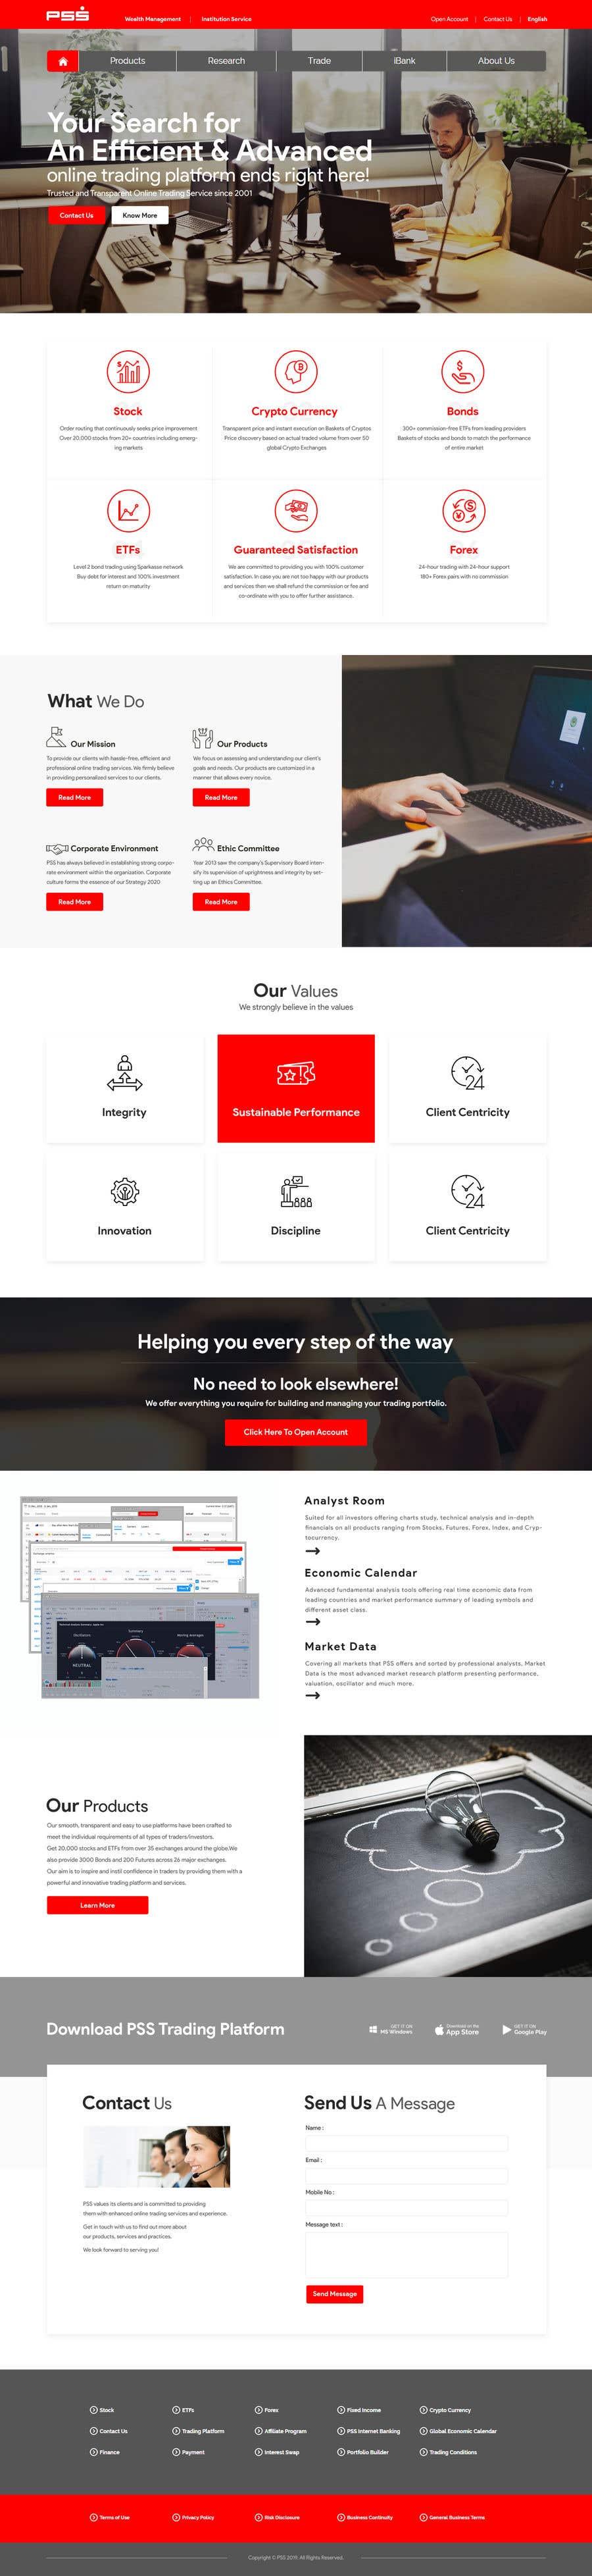 "Intrarea #18 pentru concursul ""Home page design for existing site"""